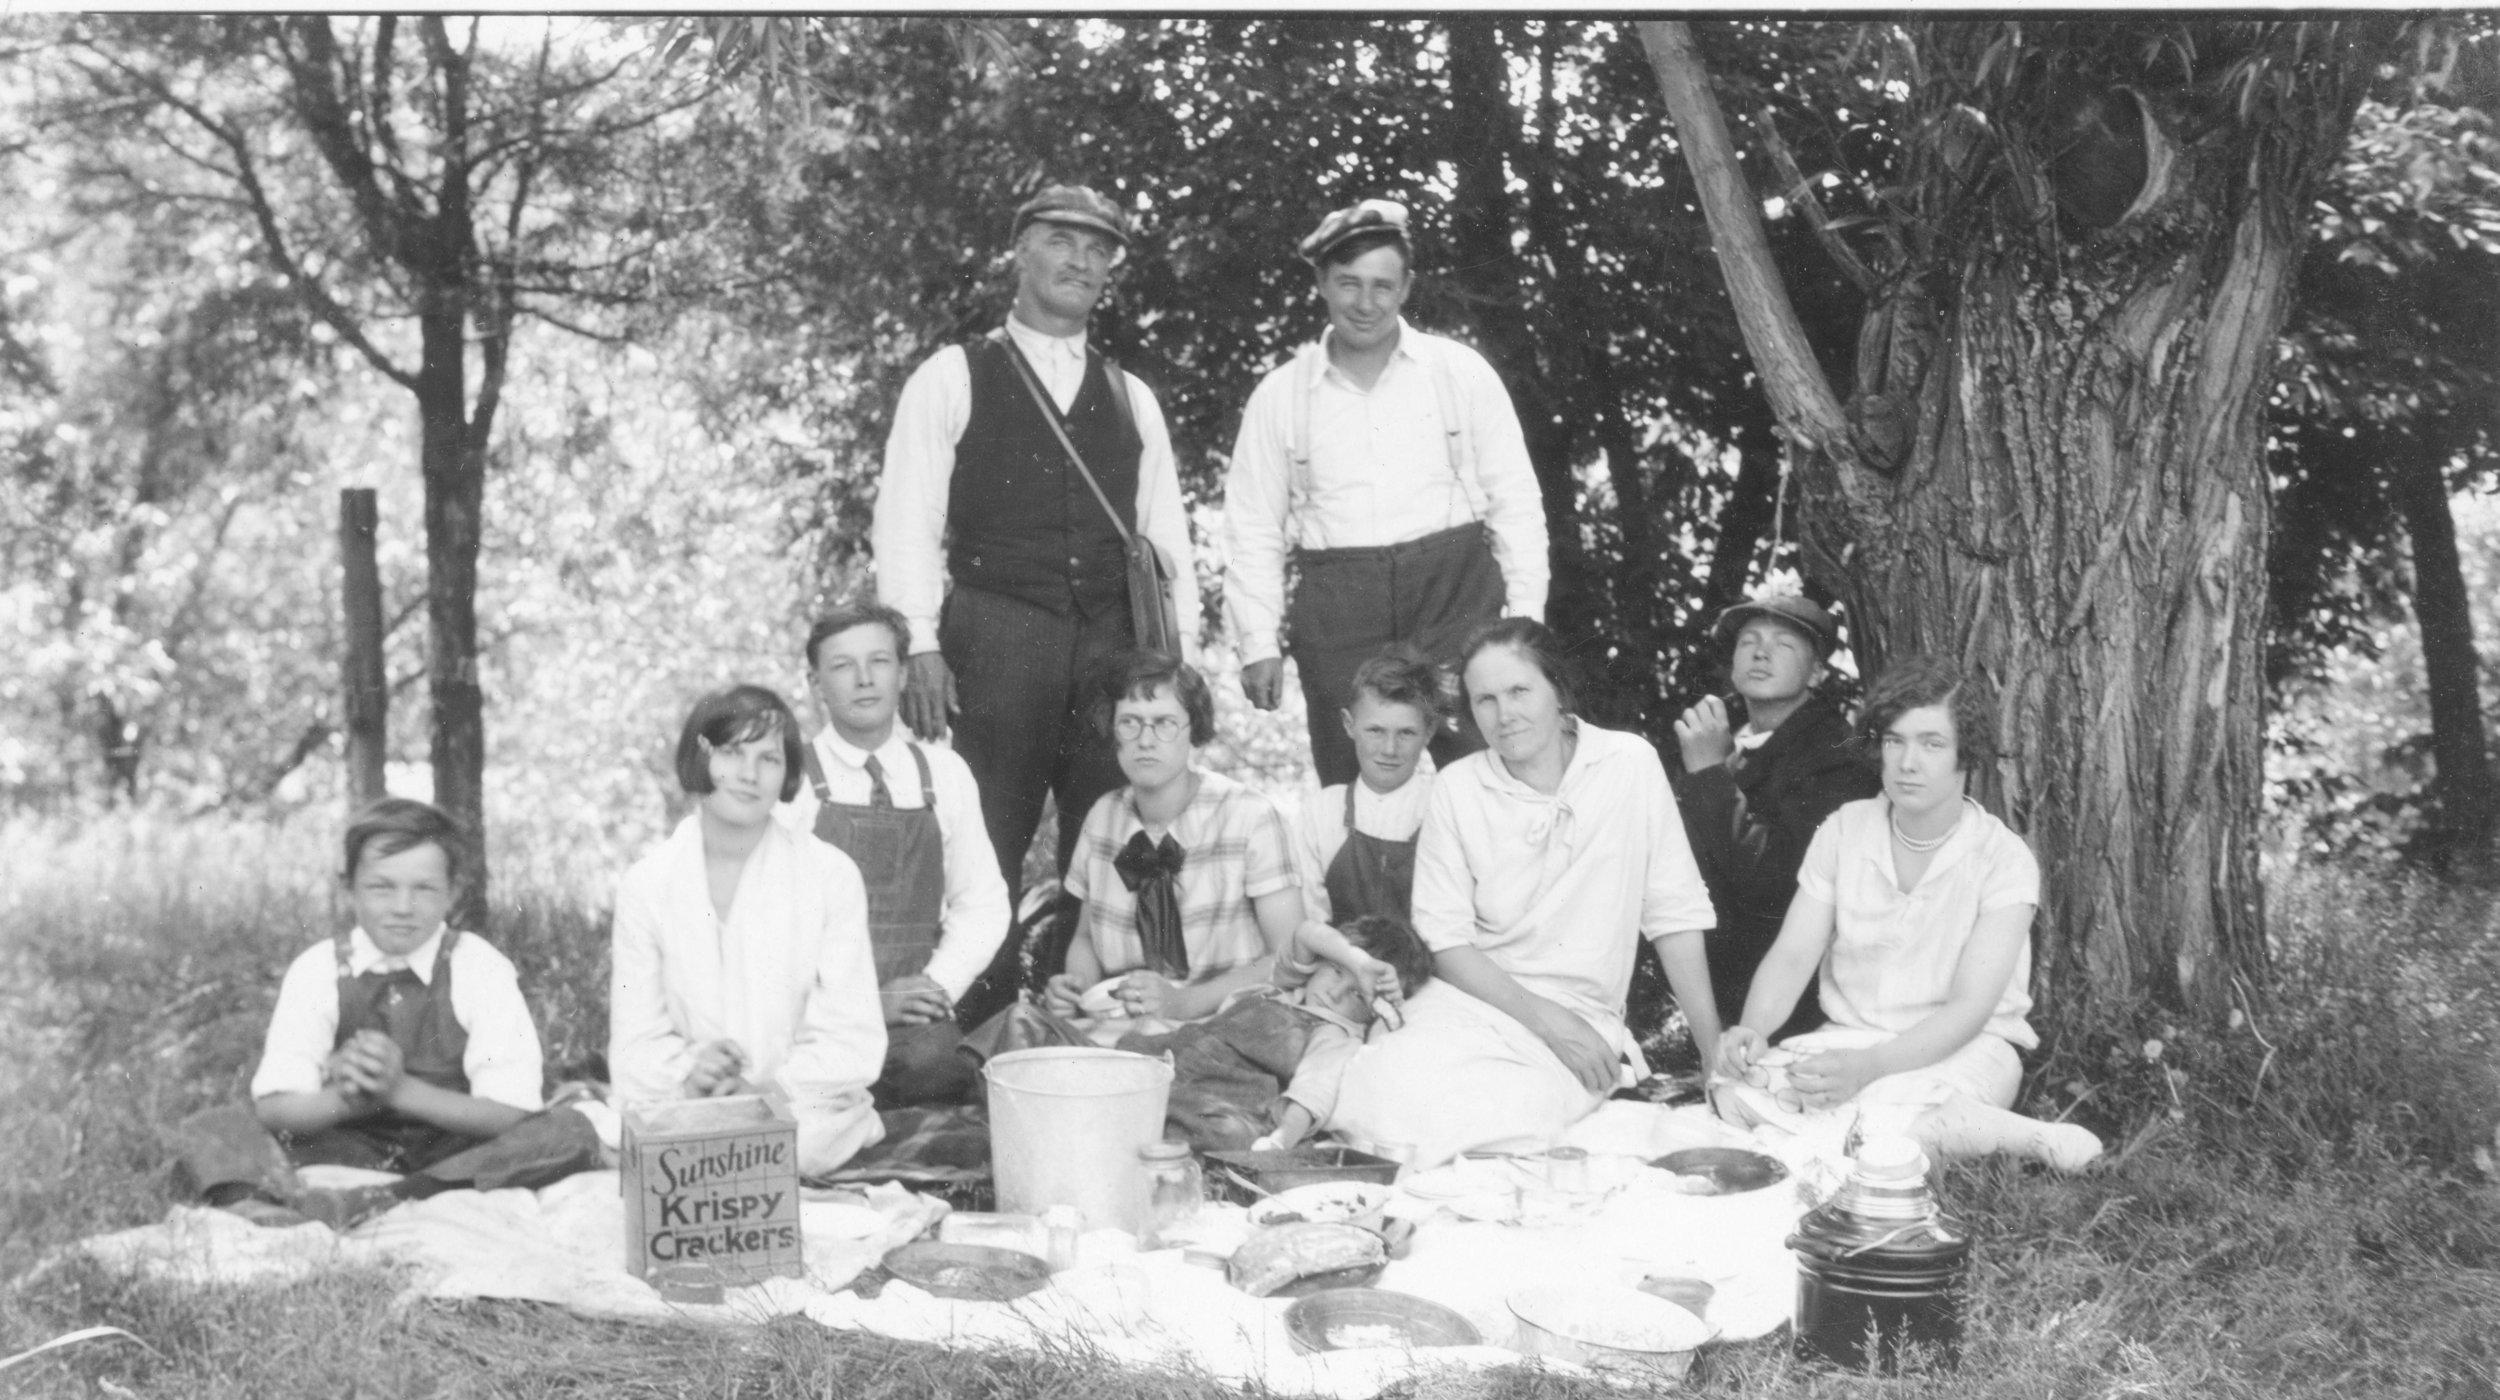 Lewerer Family Picnic Taken in late 1920's